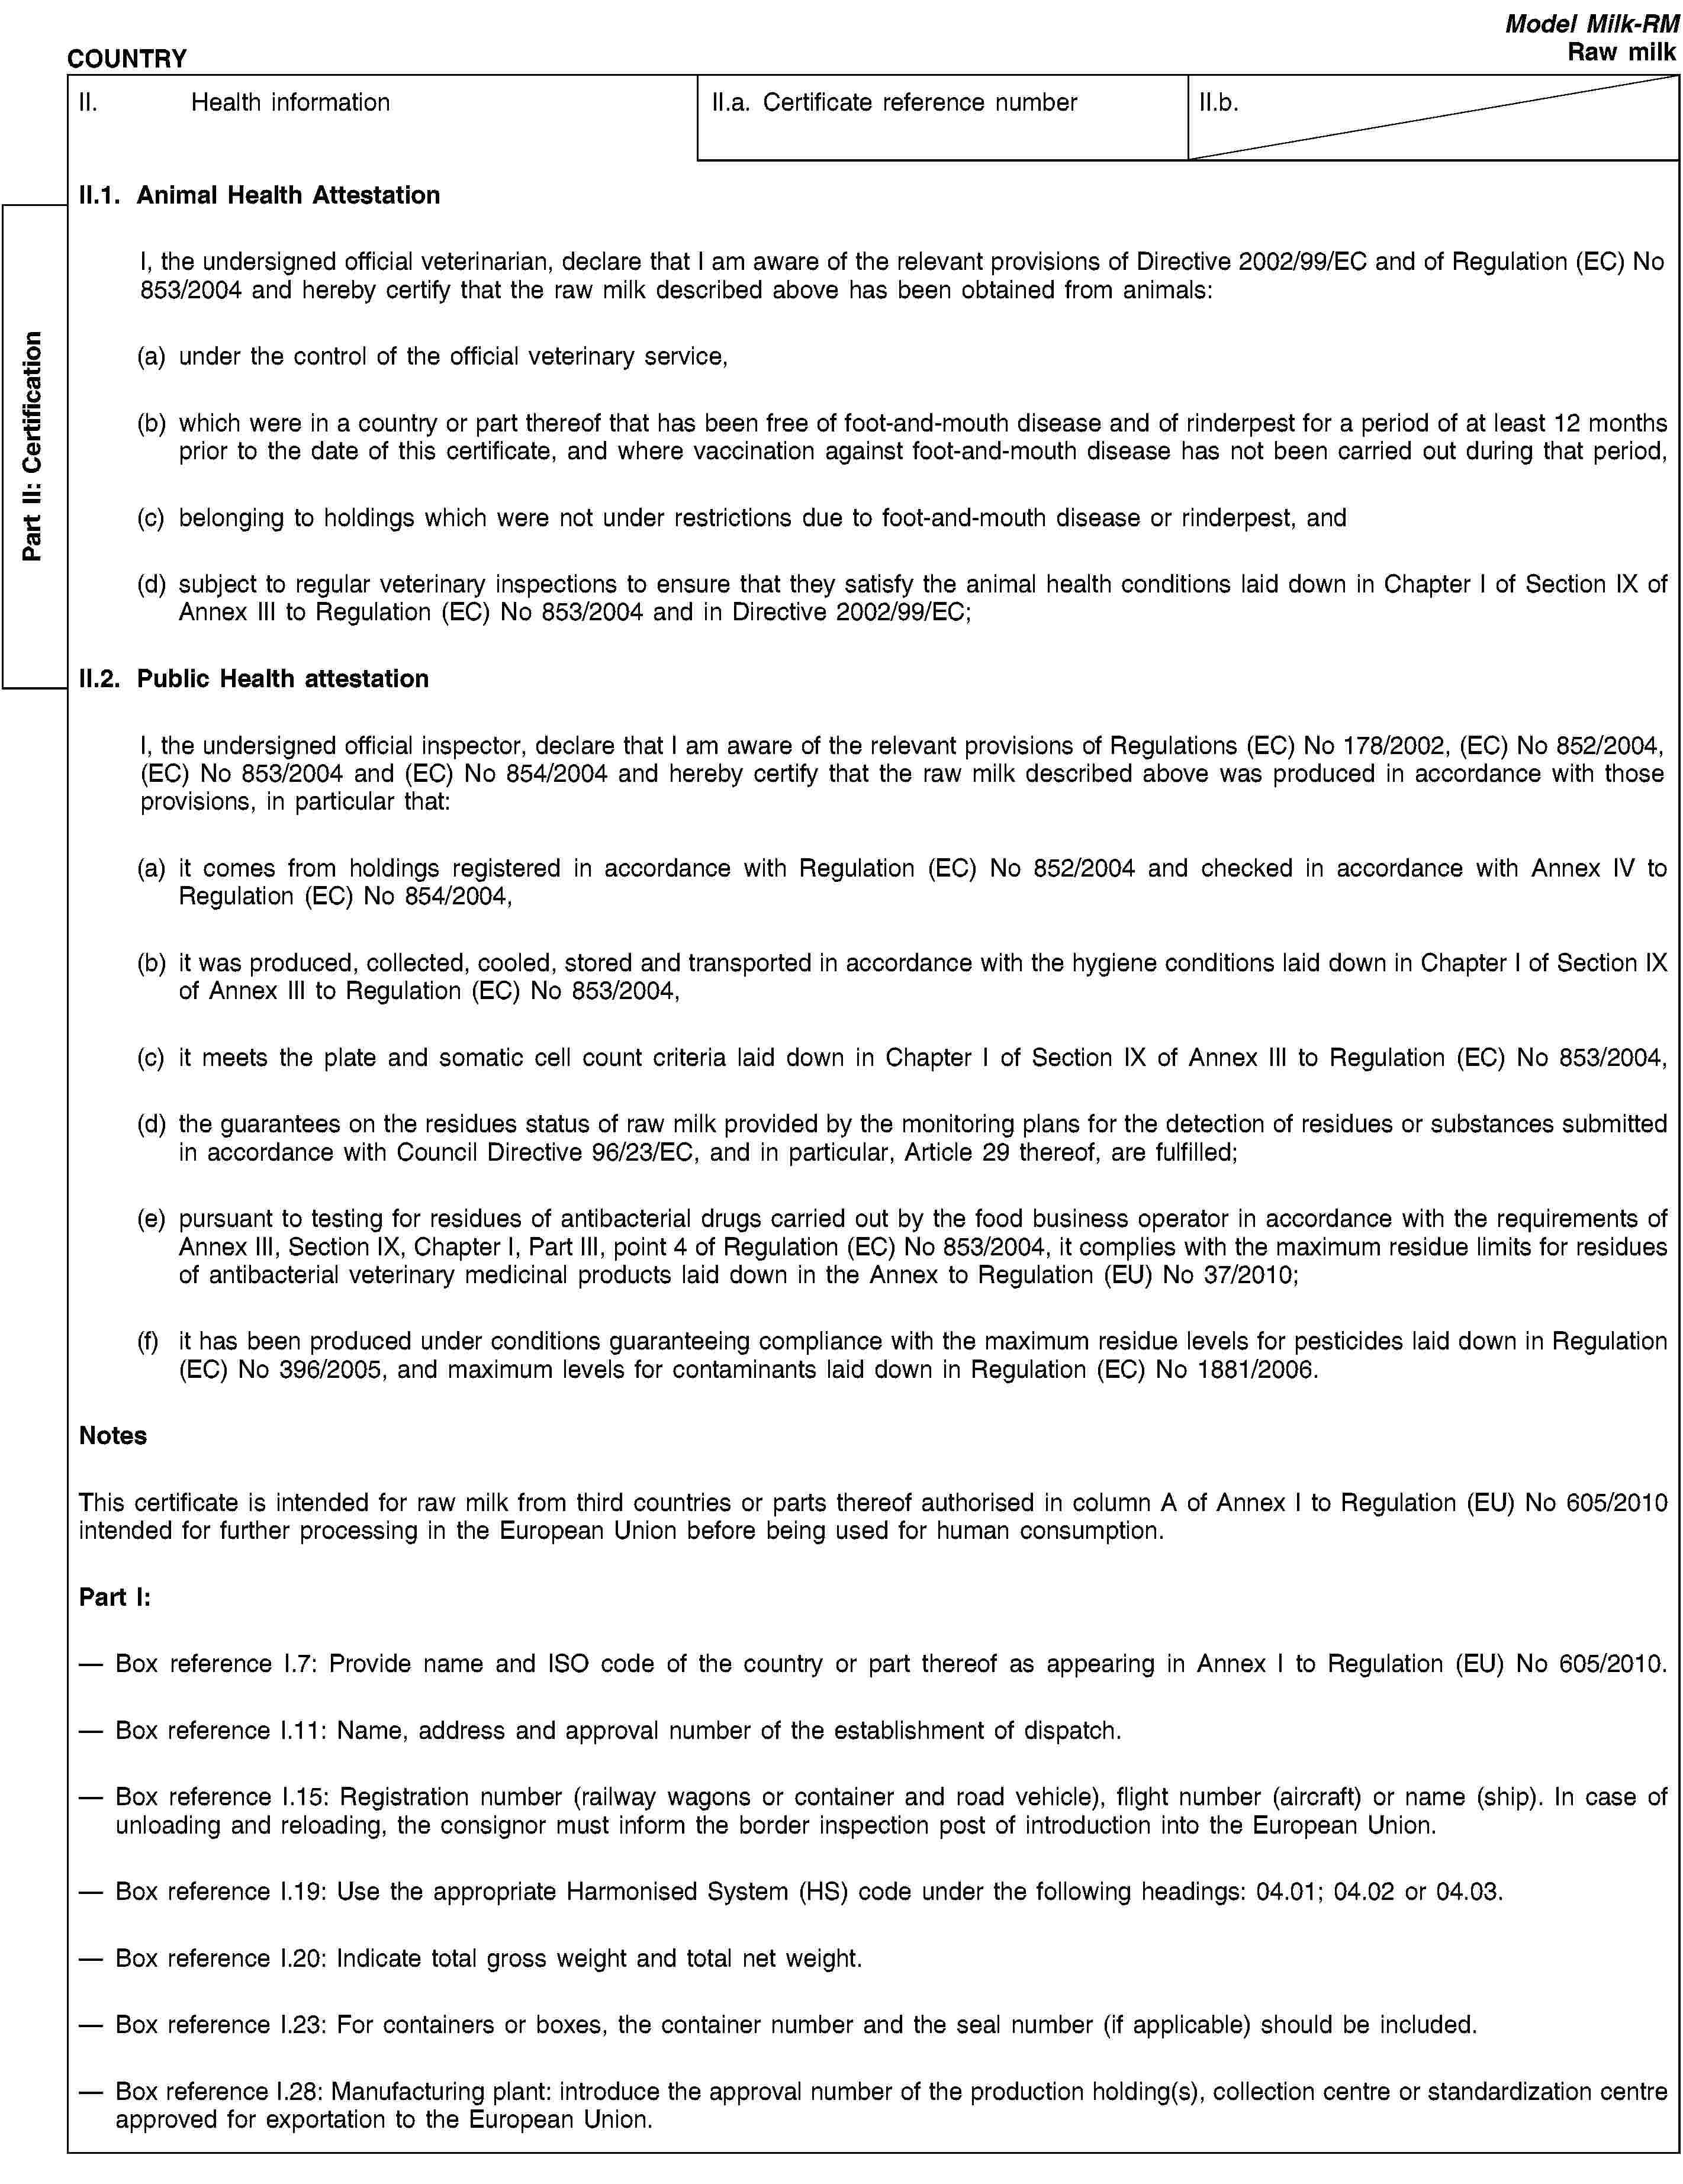 eur lex r en eur lex part ii 1057ertificationcountrymodel milk rmraw milkii health informationii a certificate reference